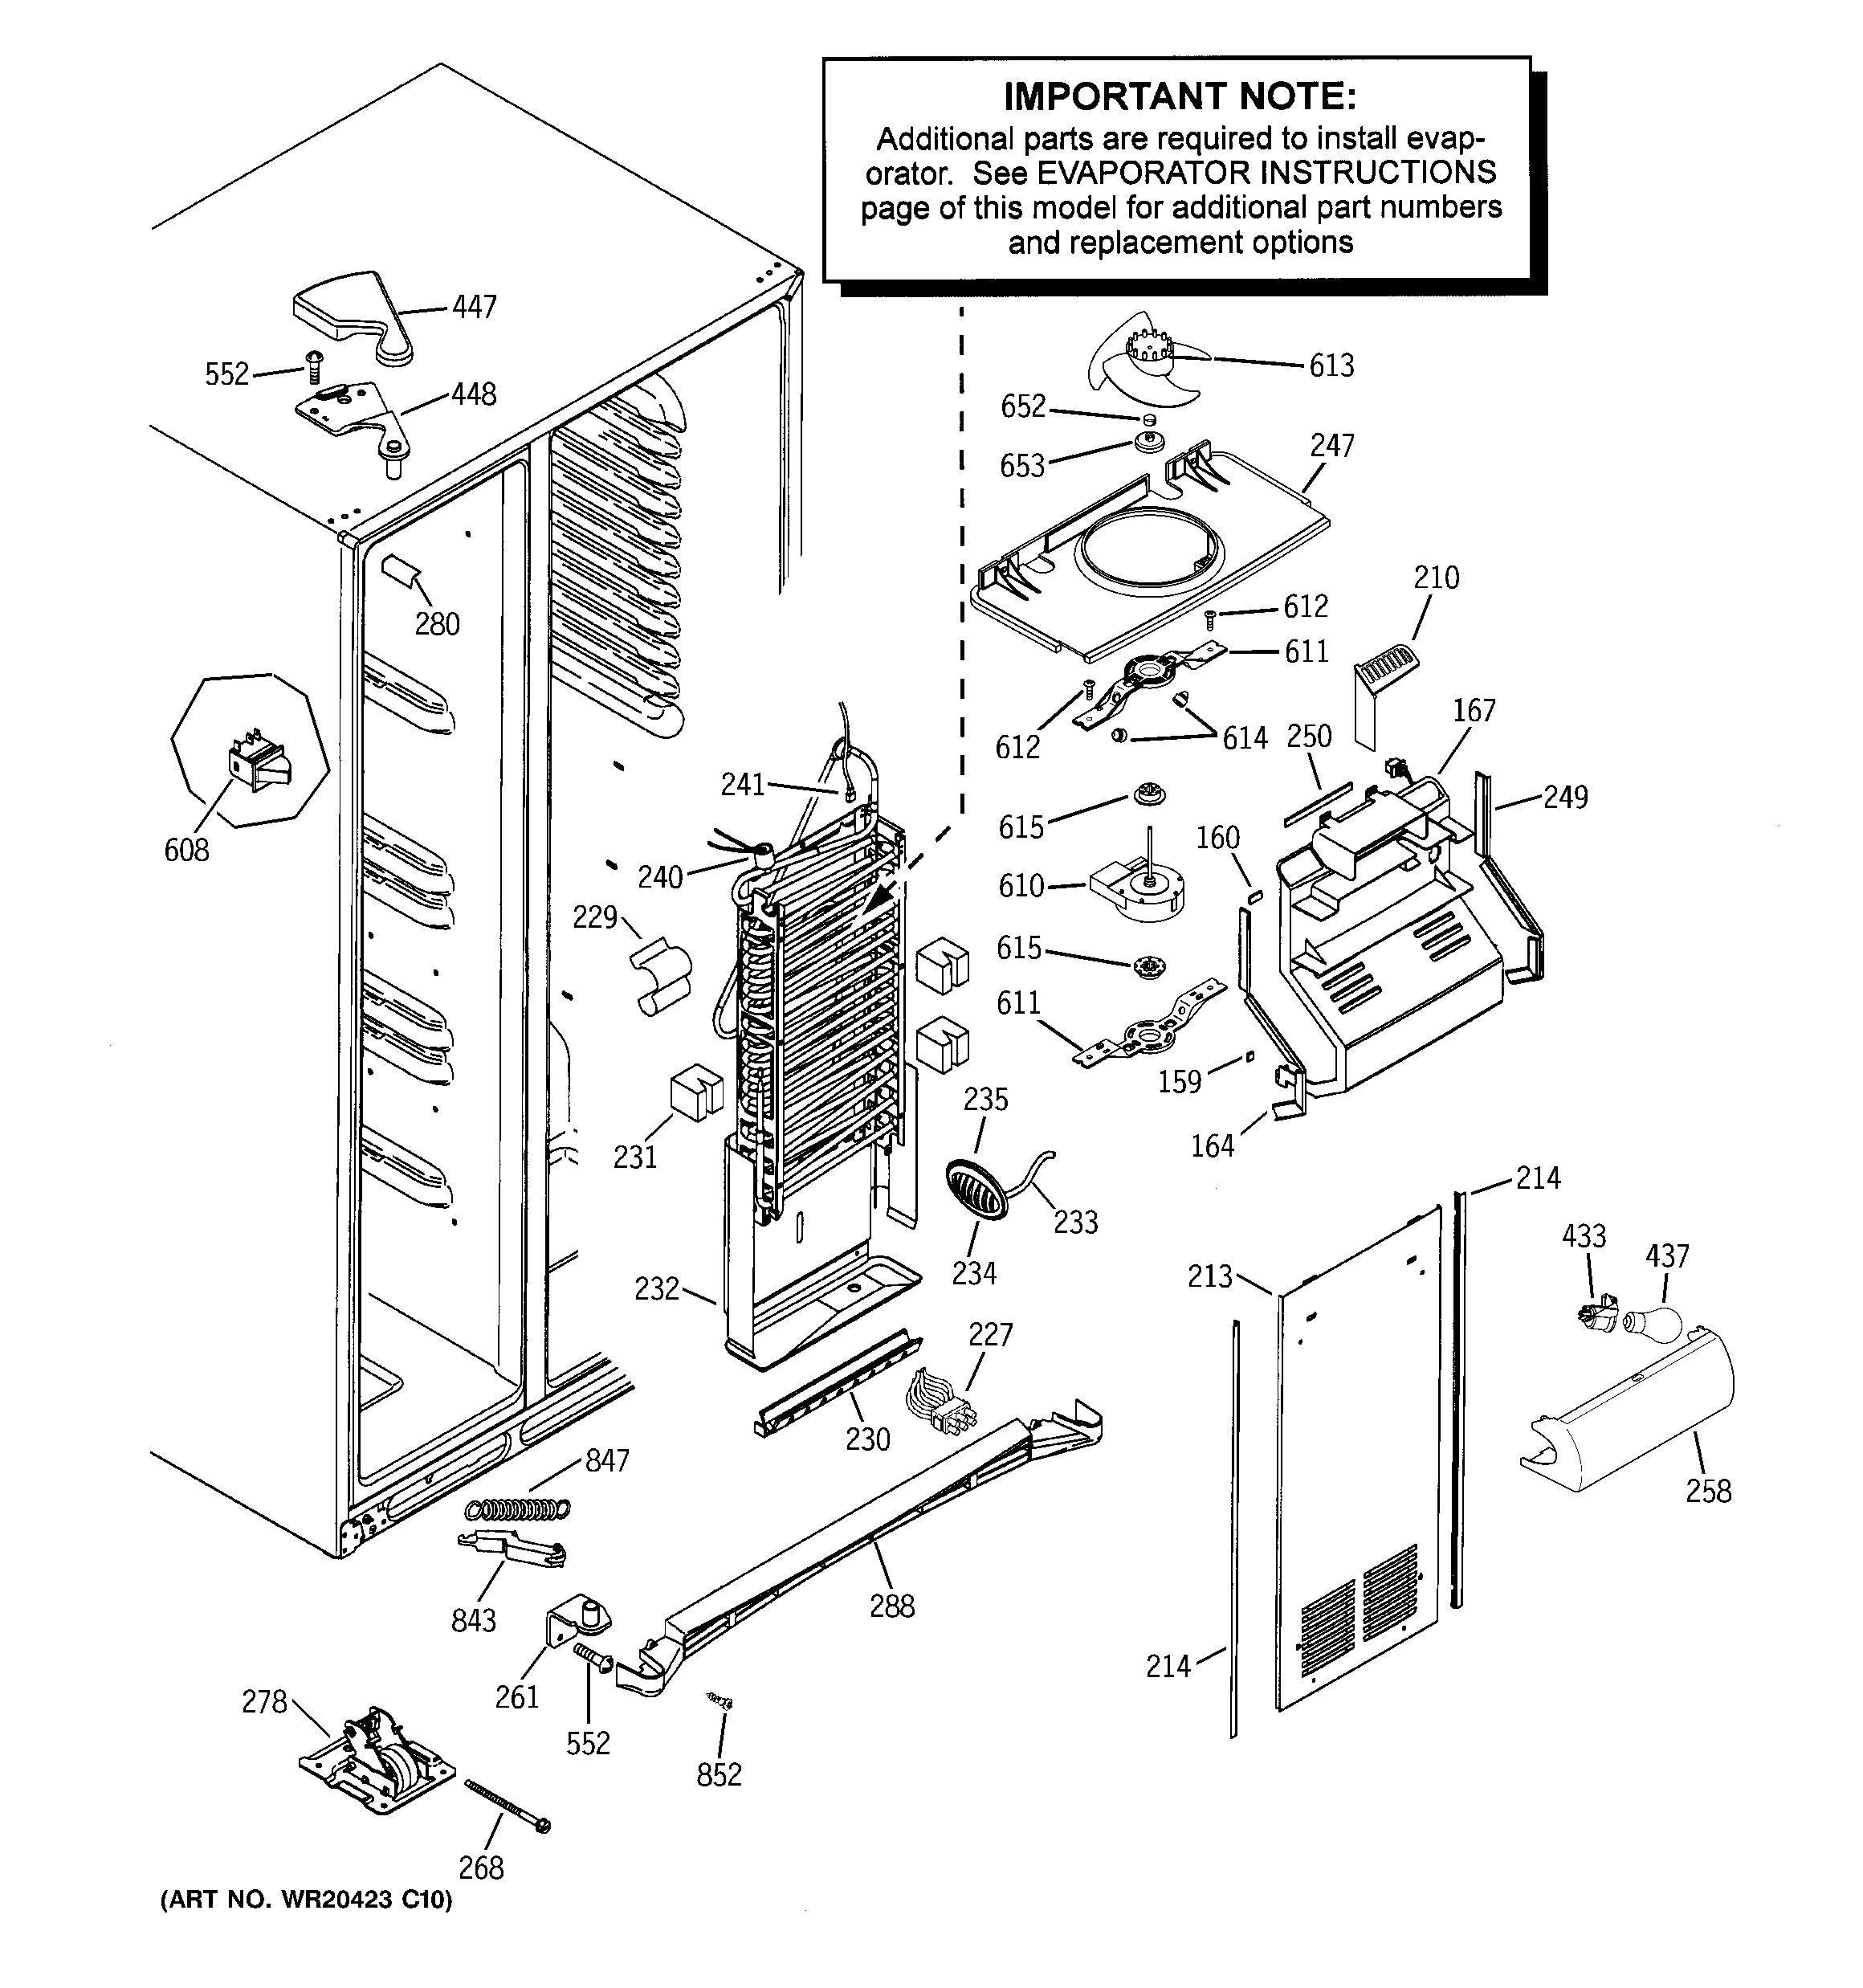 Ge Quiet Power 3 Parts Diagram Ge Refrigerator T Series Parts Model Gss25wstmss Of Ge Quiet Power 3 Parts Diagram